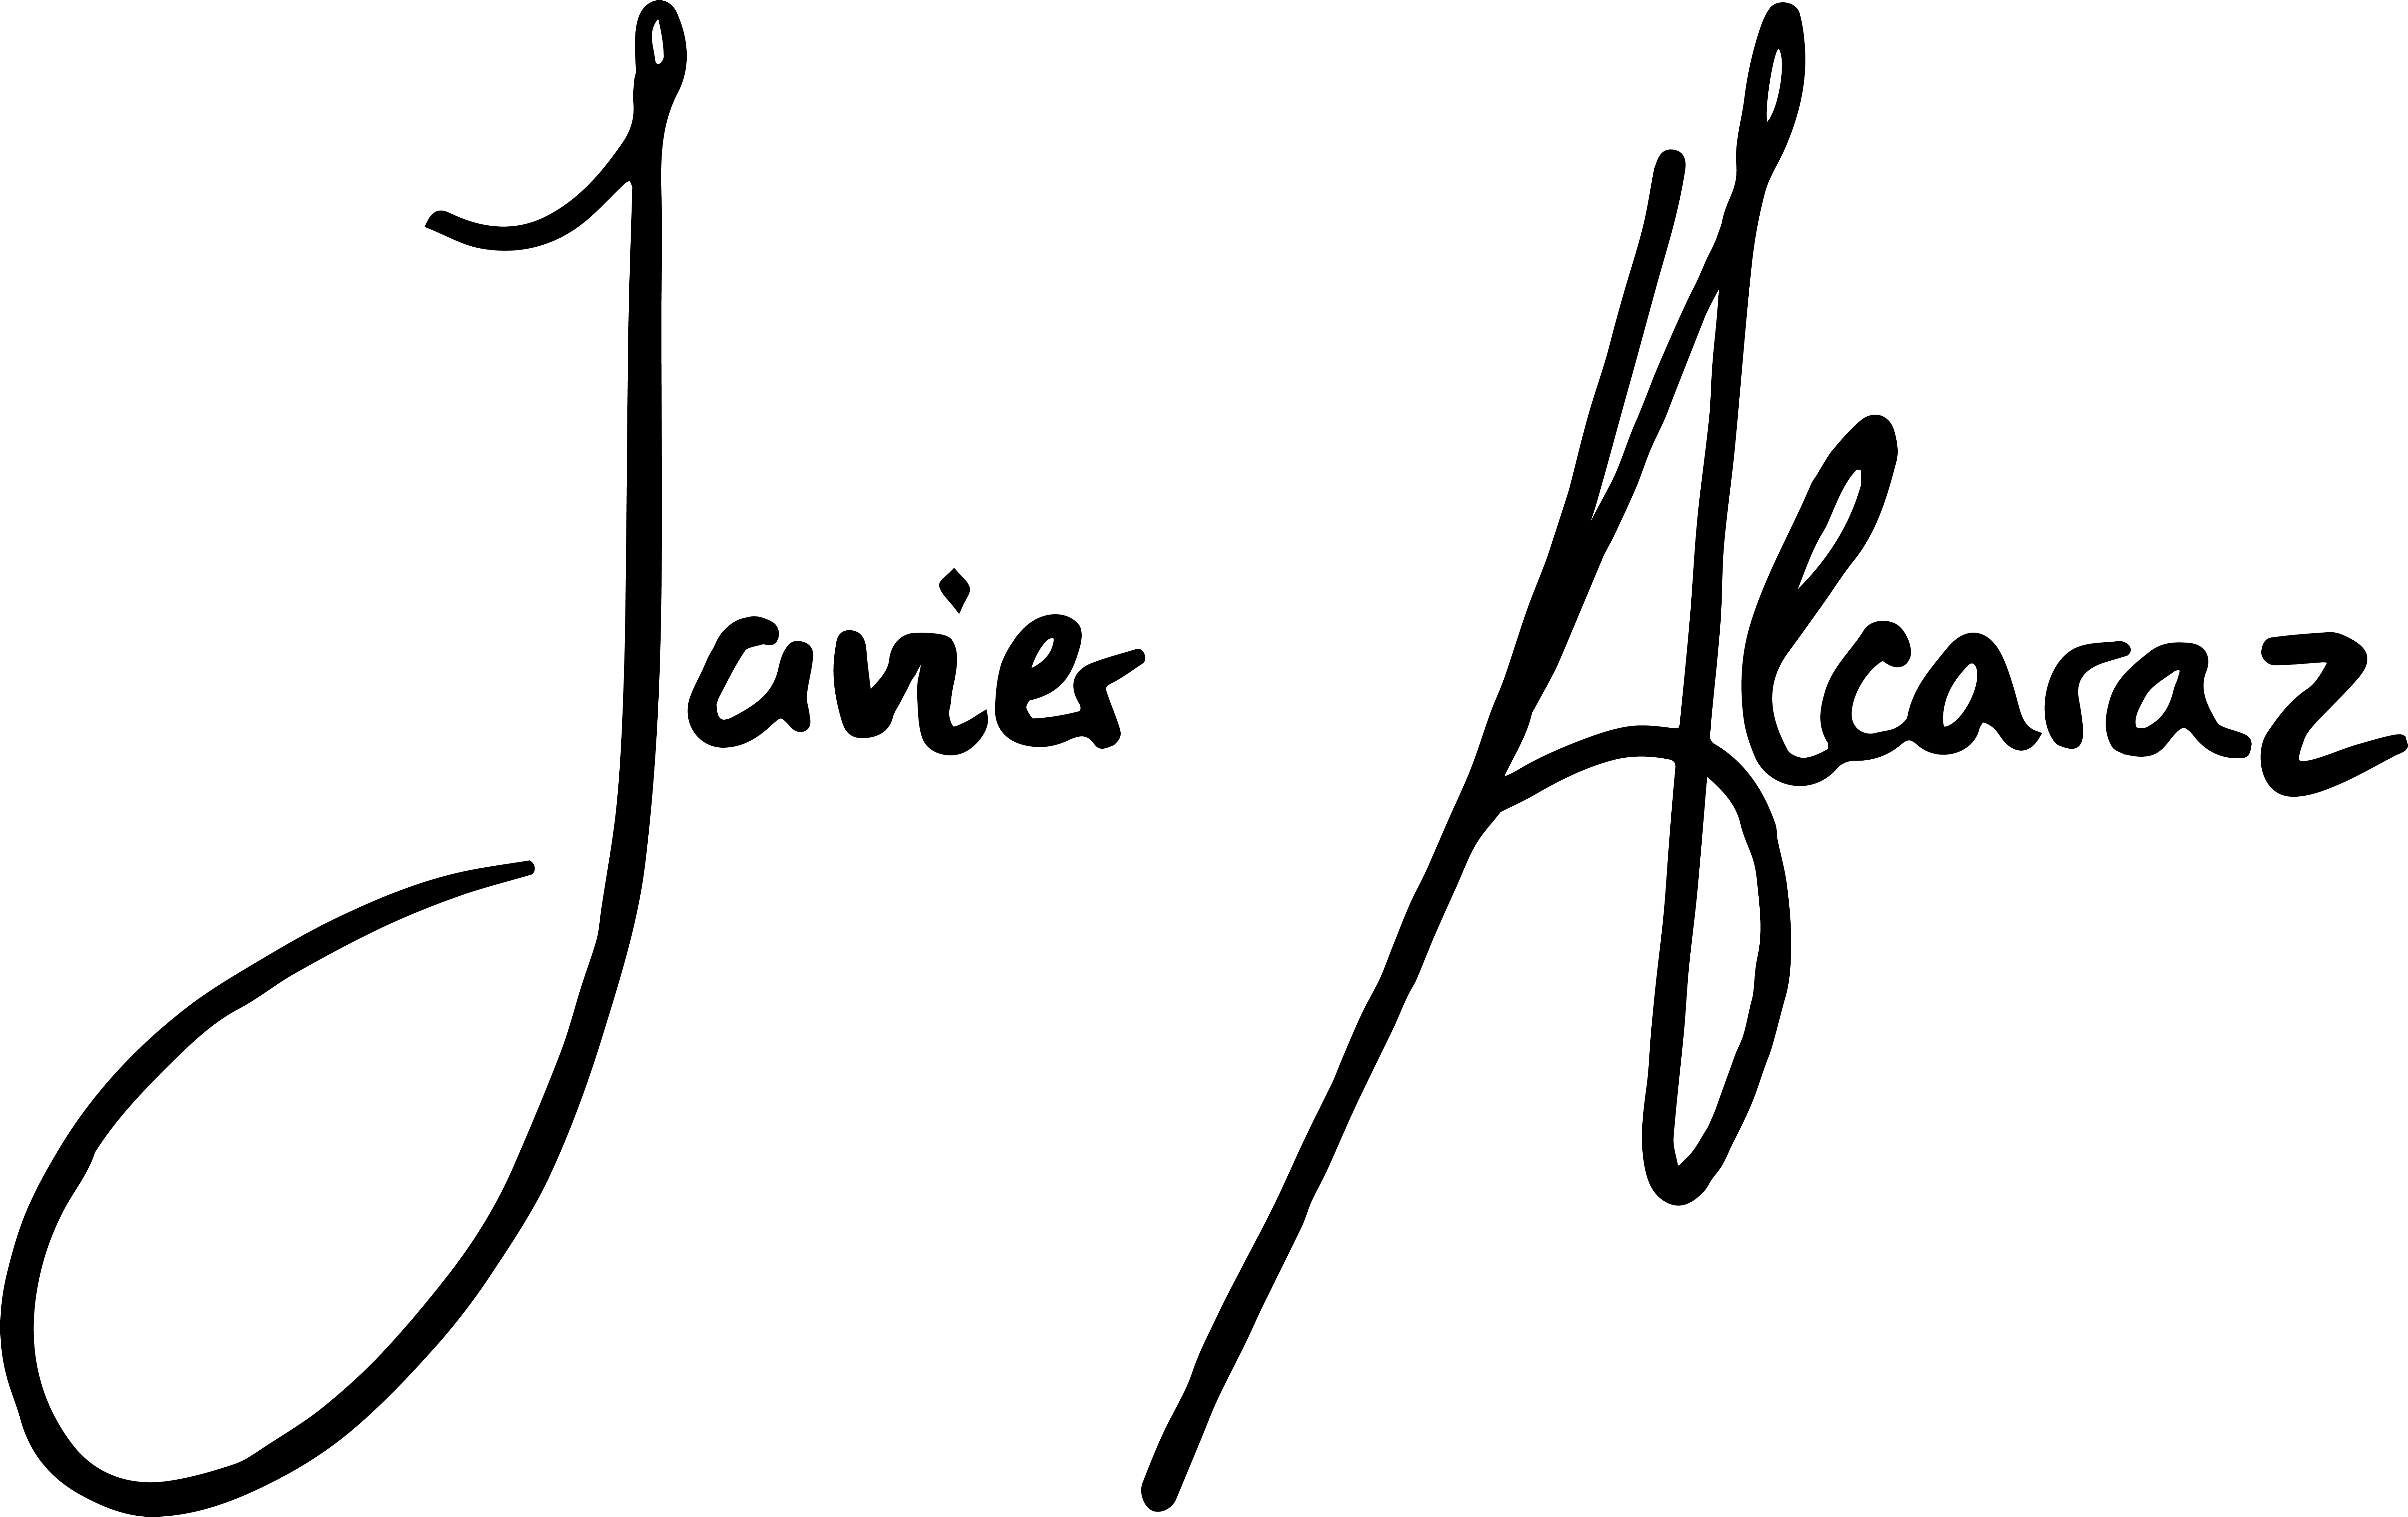 javieralcaraz